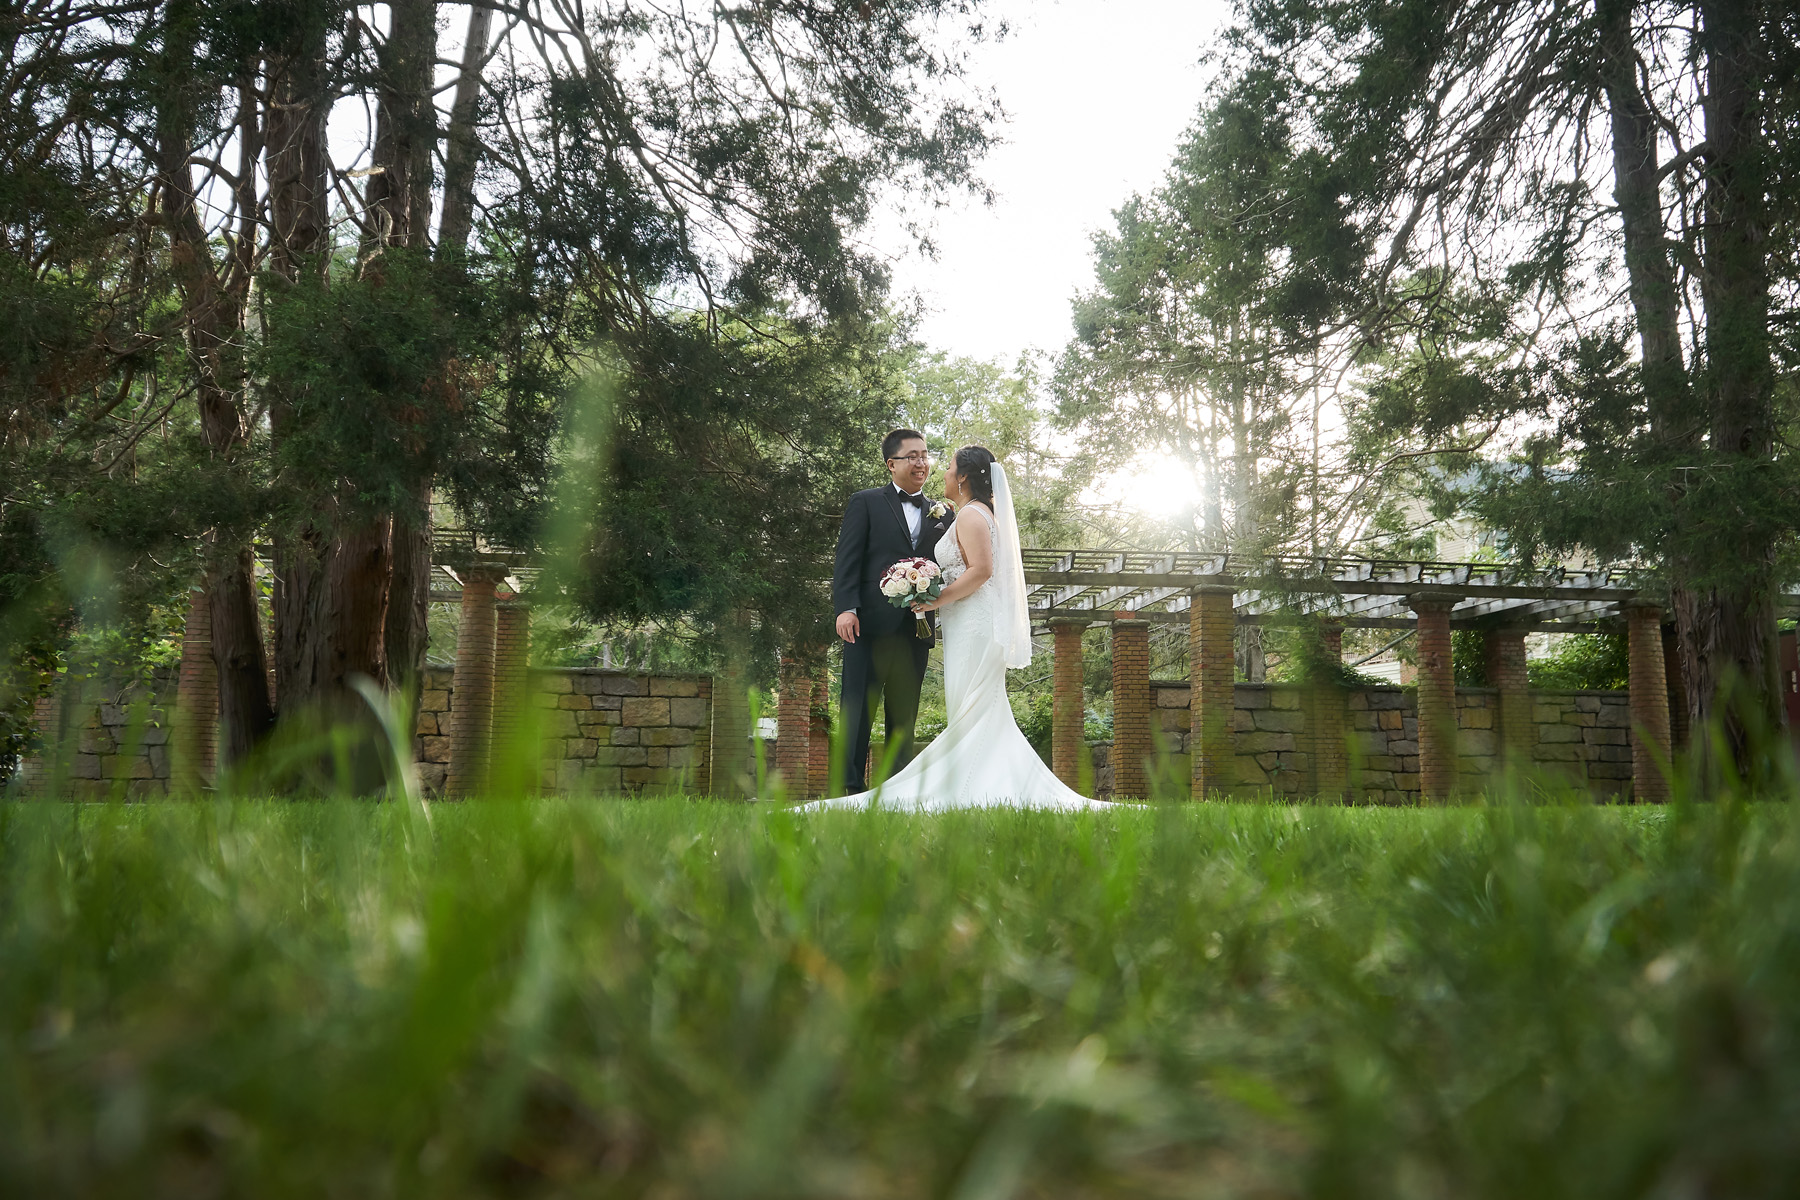 061-Bobby-a-photographic-memory-wedding-photography_BOB00248.jpg